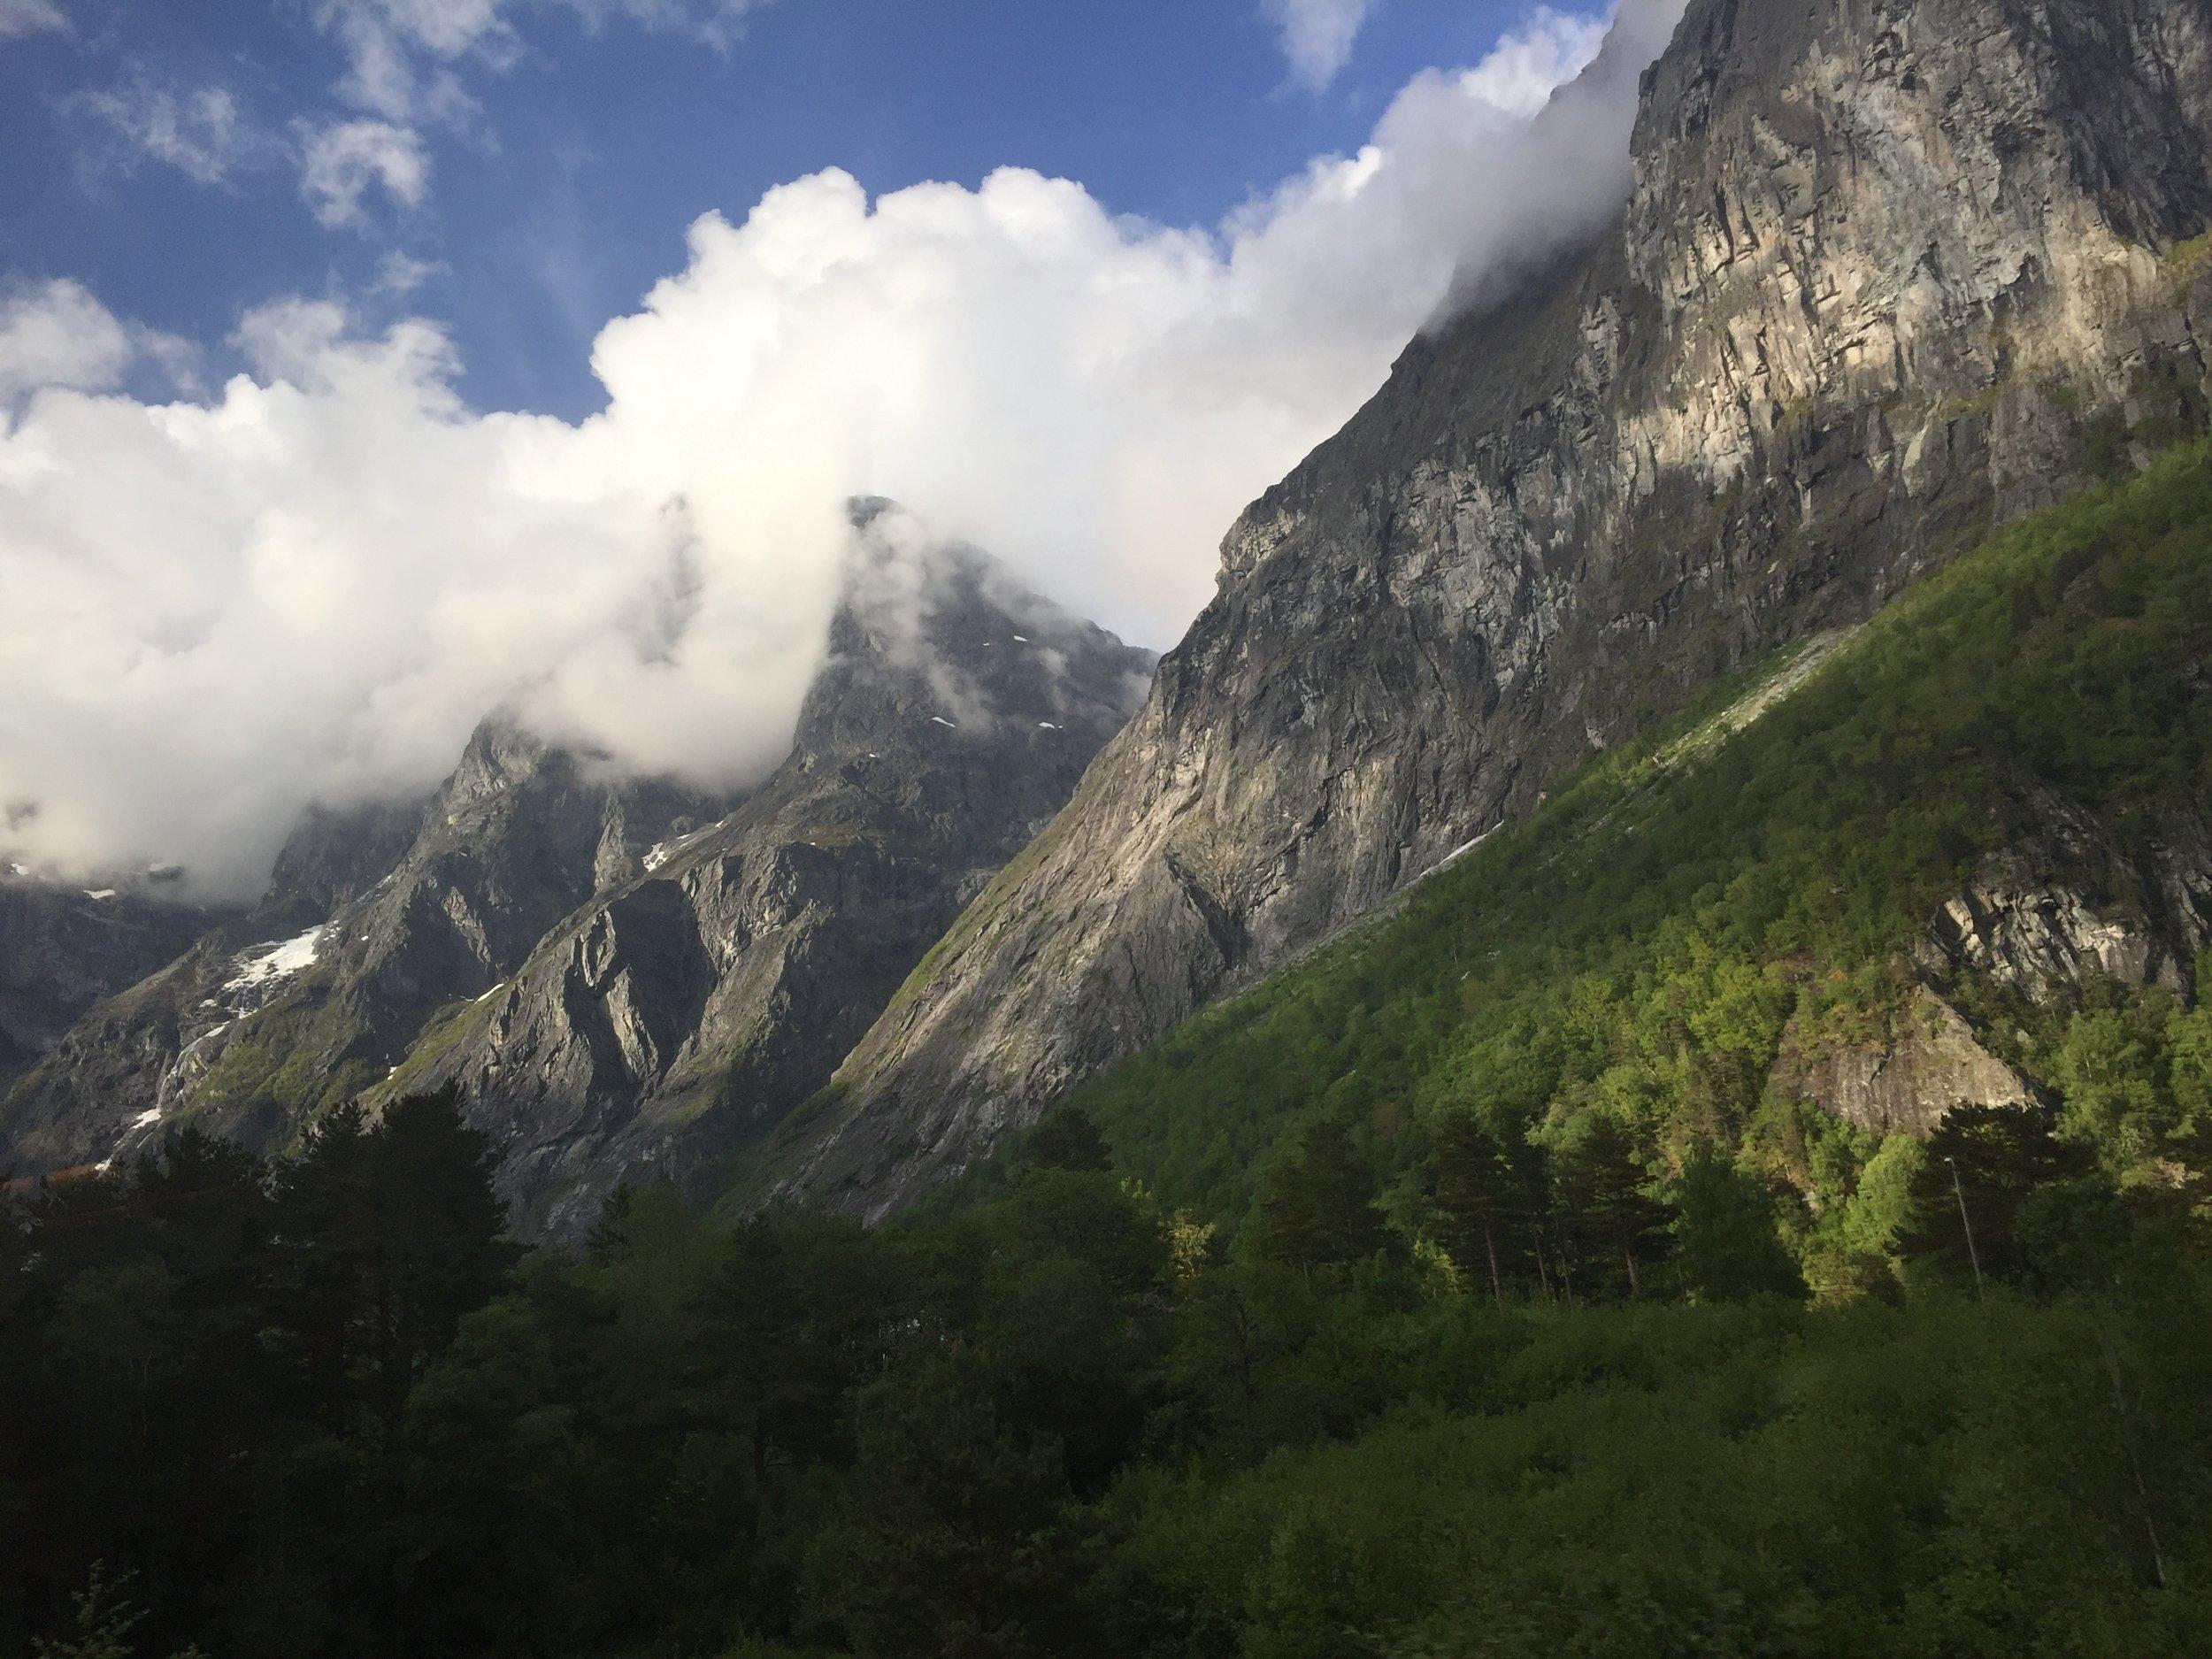 View of Rauma Valley from Rauma Railway, Norway.